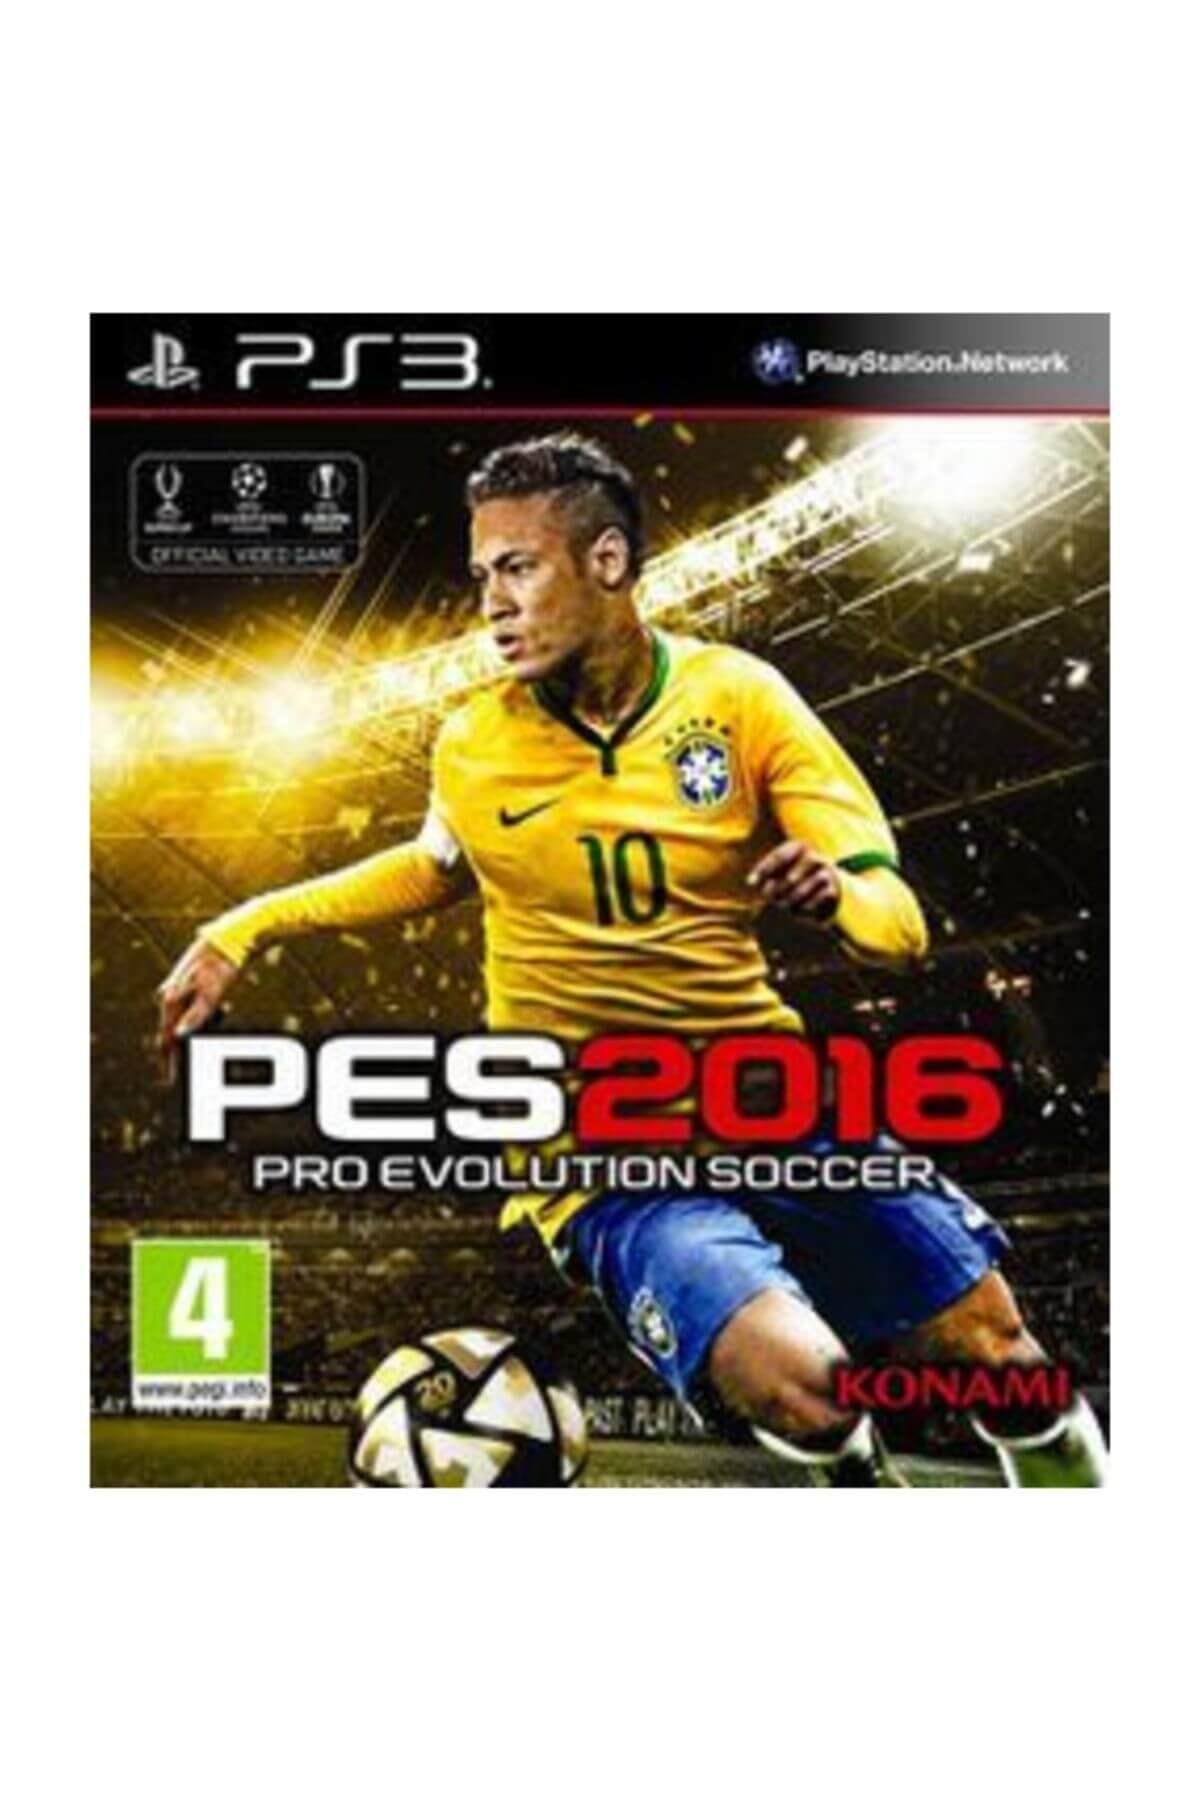 KONAMI Playstation 3 Oyunu Türkçe Menü ( Pes 2016 Ps3 ) Oyun 1